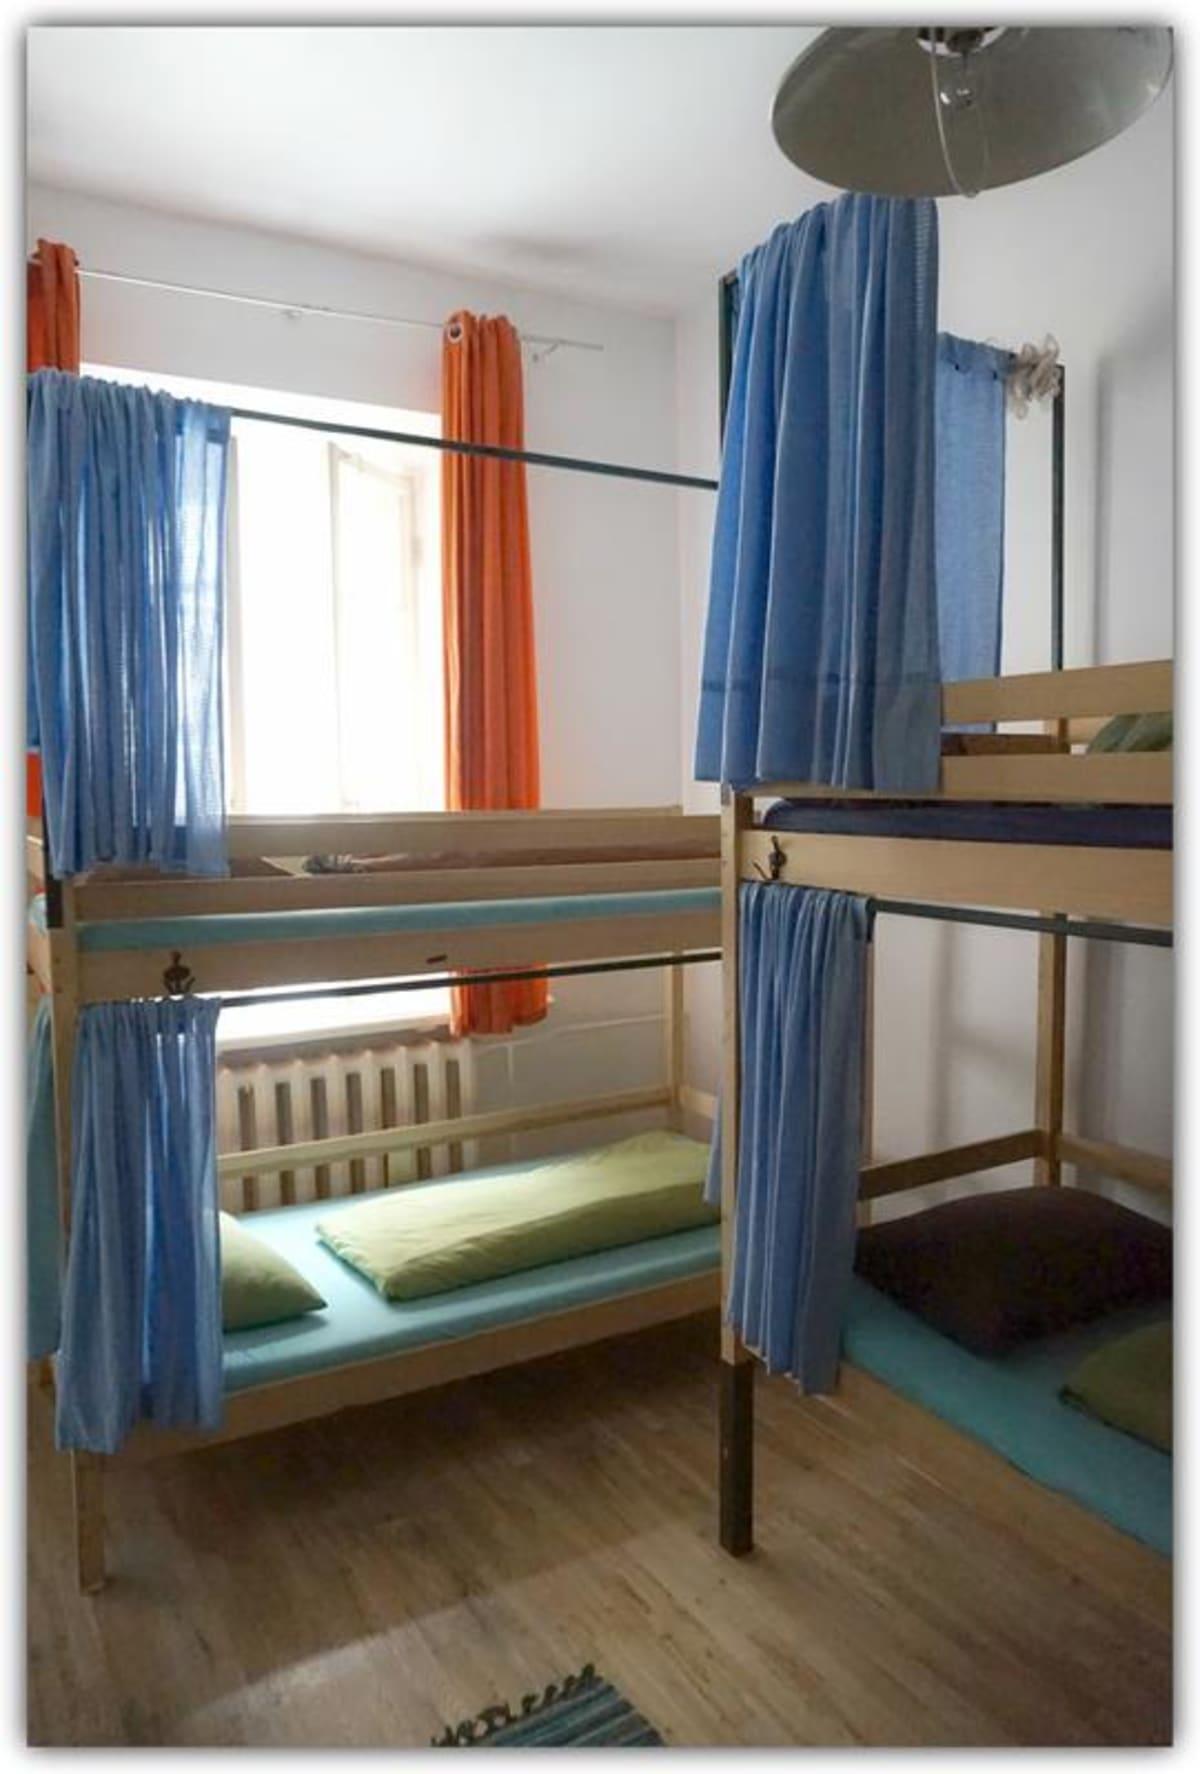 Jimmy Jumps House/Hostel, Vilnius, Lithuania hostel